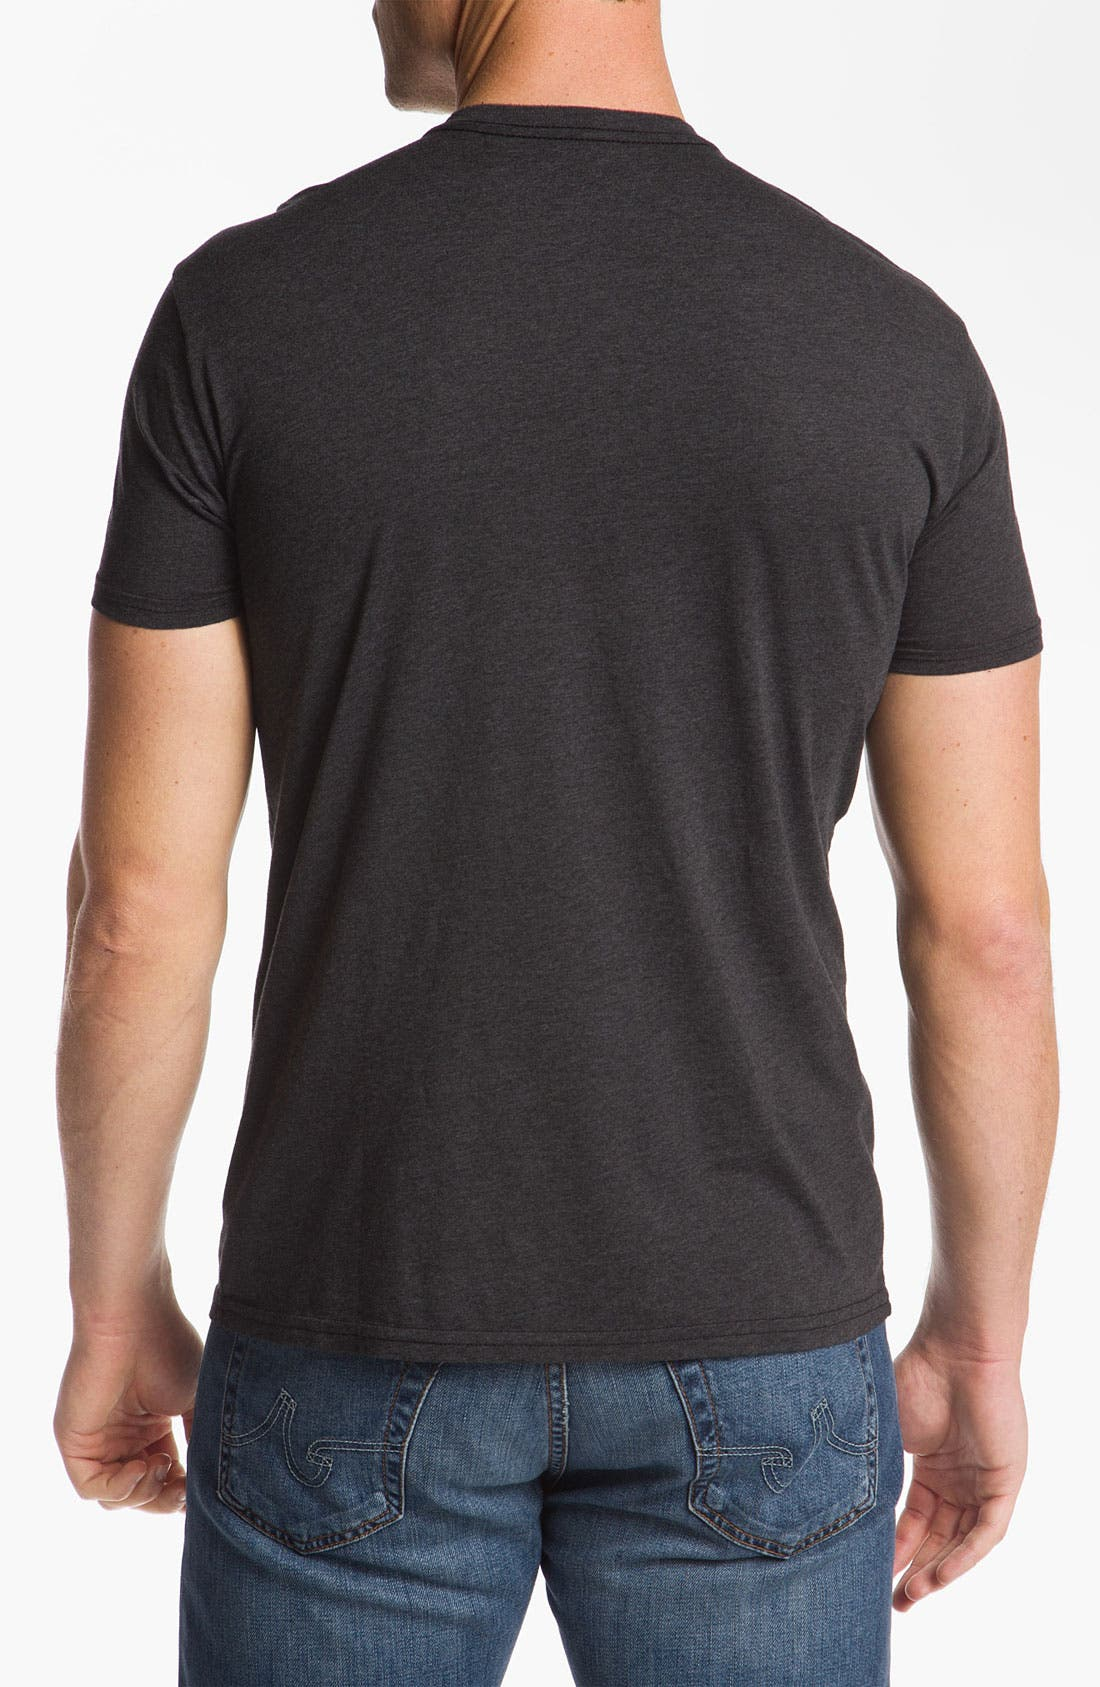 Alternate Image 2  - The Original Retro Brand 'University of Washington Huskies' T-Shirt